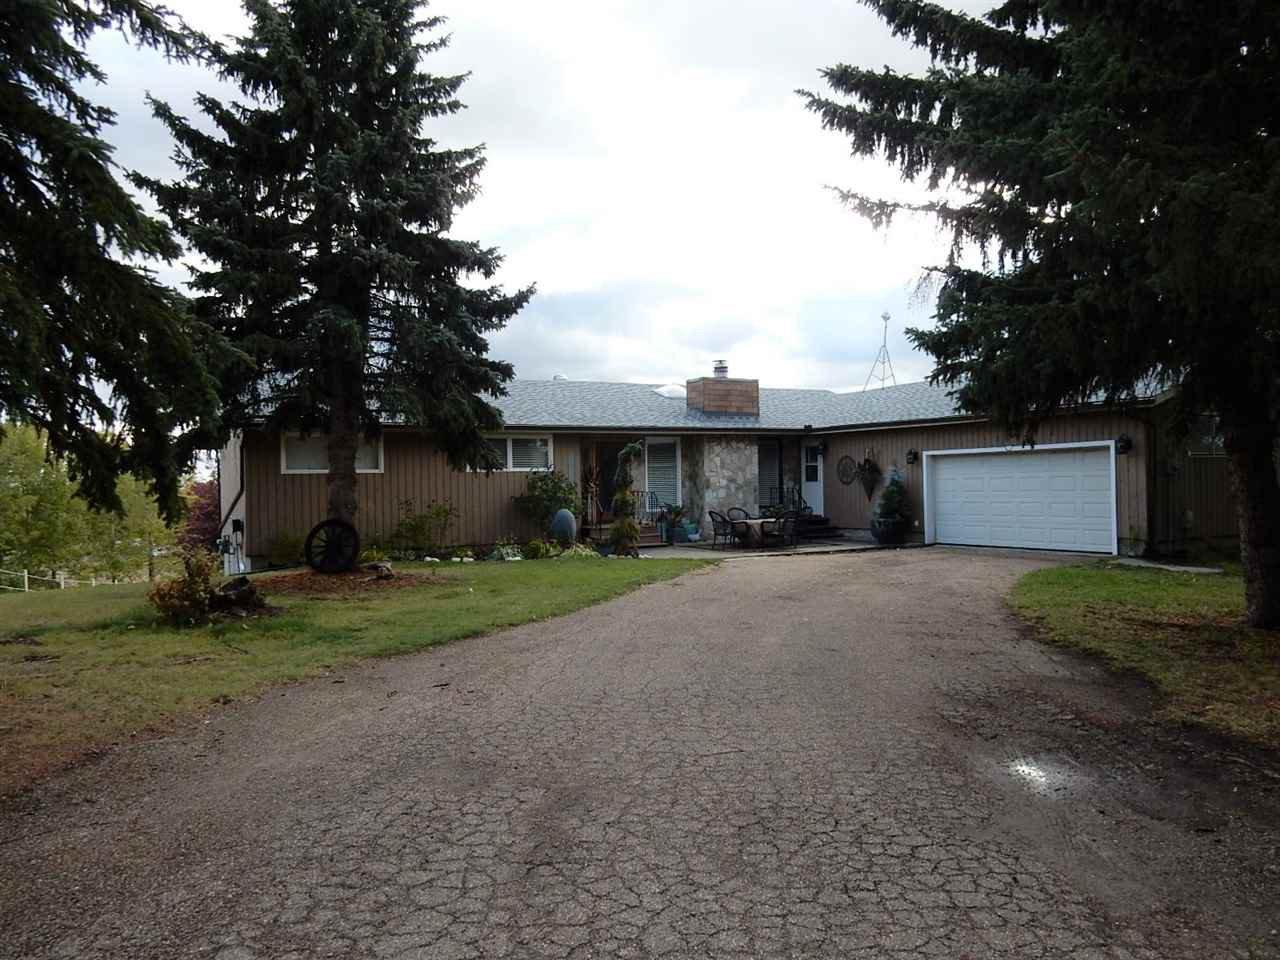 Main Photo: 182 52063 Range Road 225: Rural Strathcona County House for sale : MLS®# E4162363